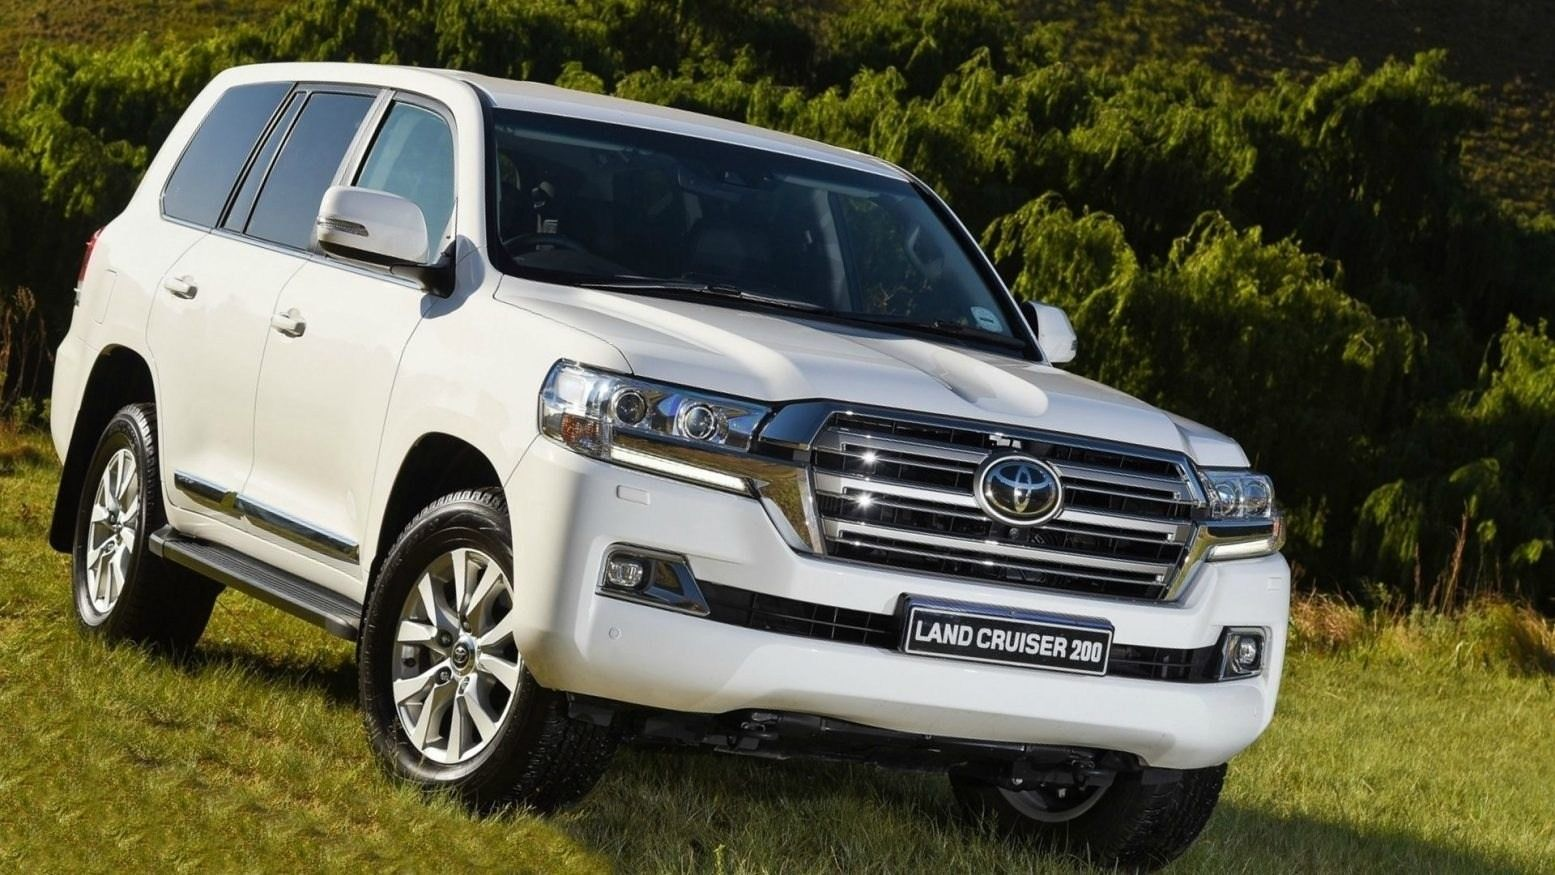 2019 Toyota Land Cruiser Usa Overview Toyota Land Cruiser Land Cruiser 200 Land Cruiser